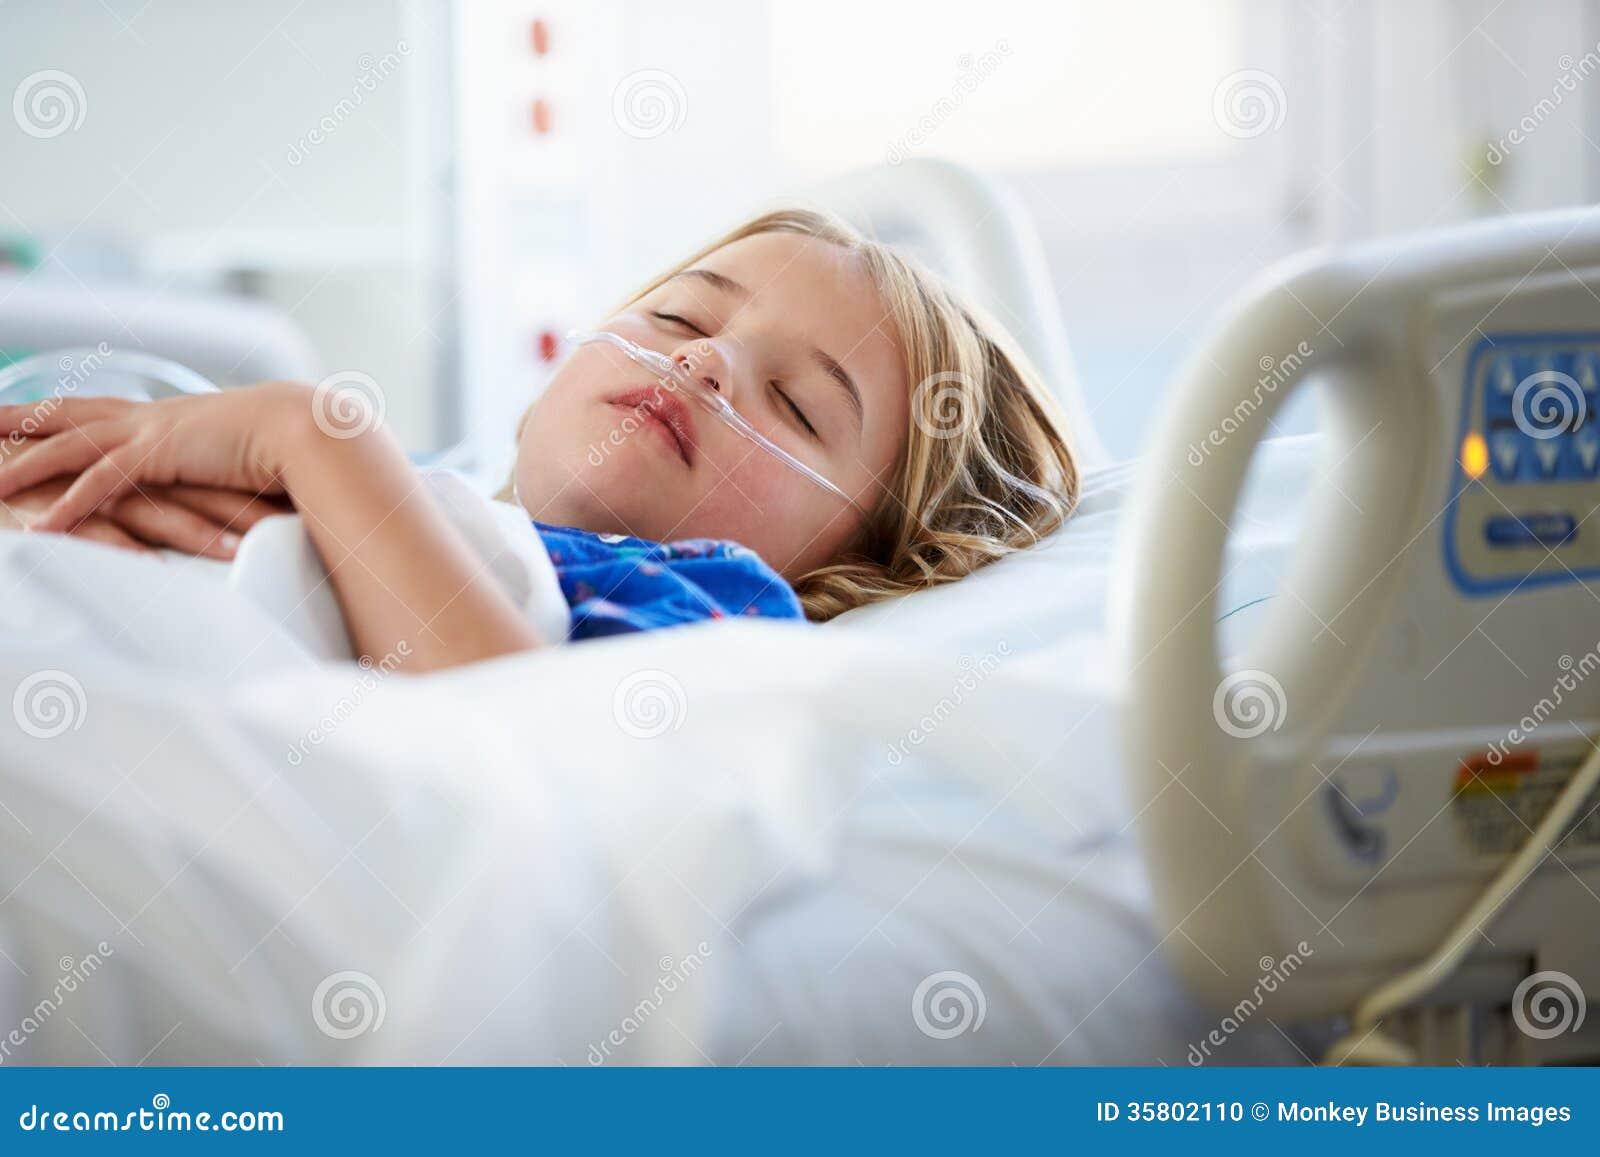 Street Hospital Teen Sleep The 50